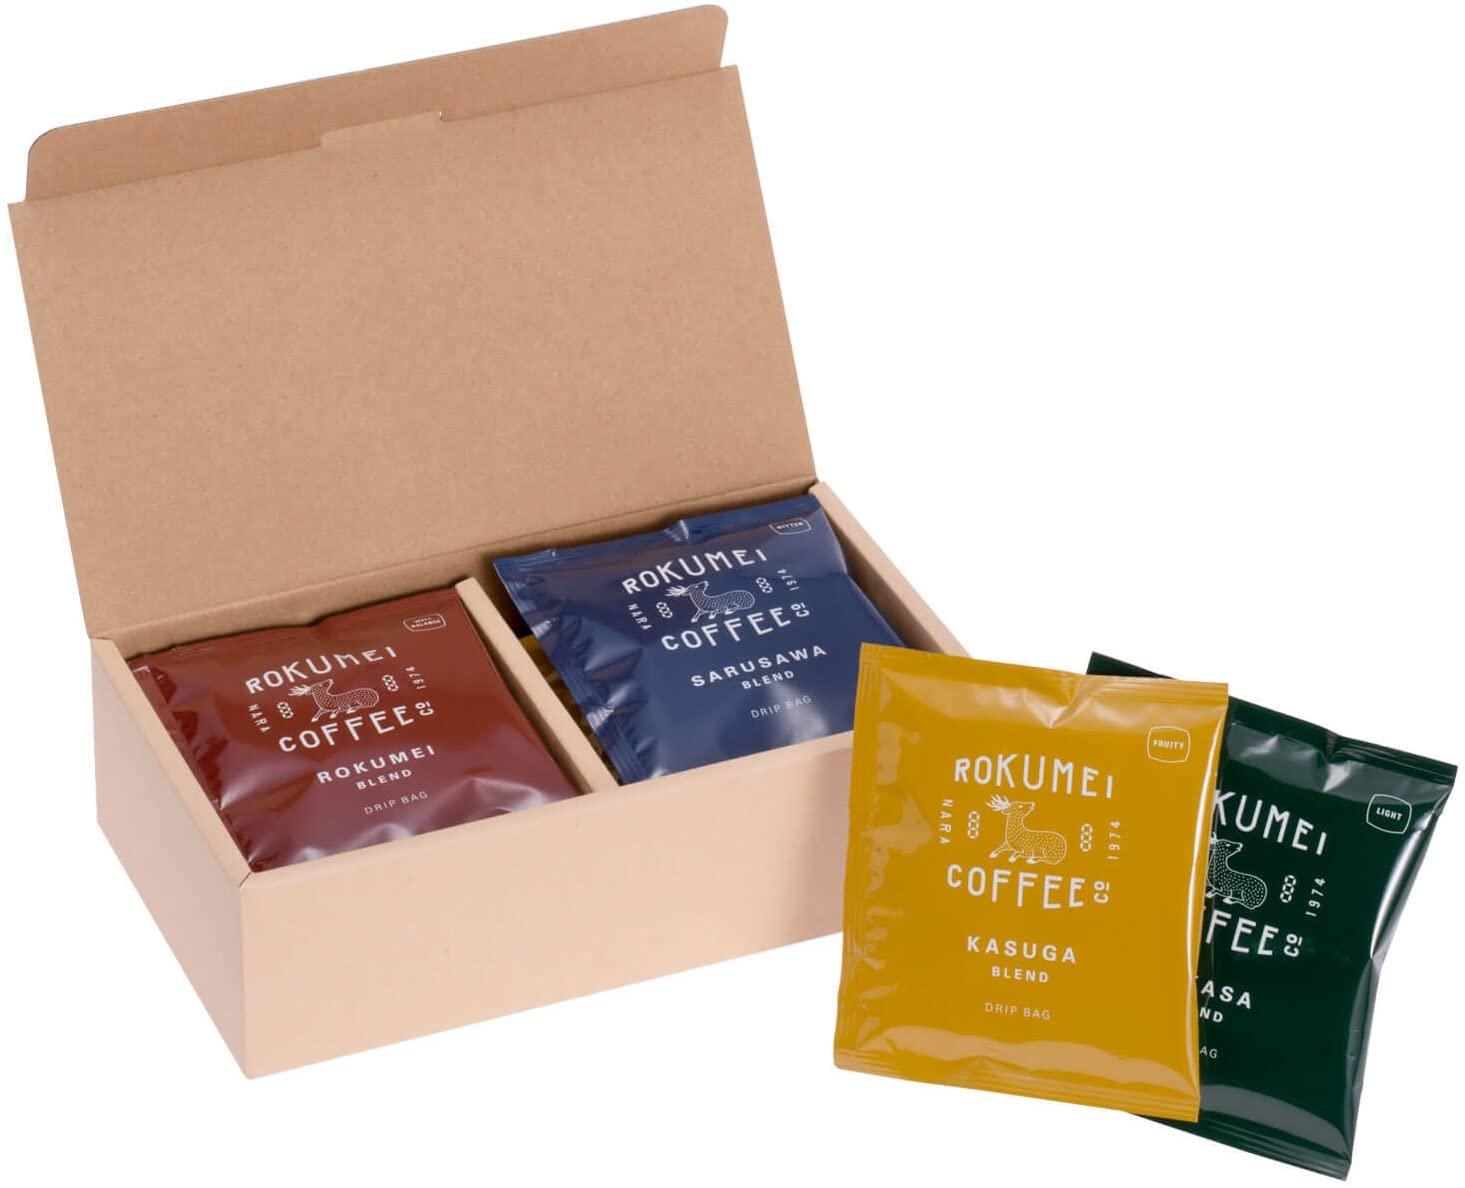 ROKUMEI COFFEE CO. ドリップ バッグ ドリップコーヒー